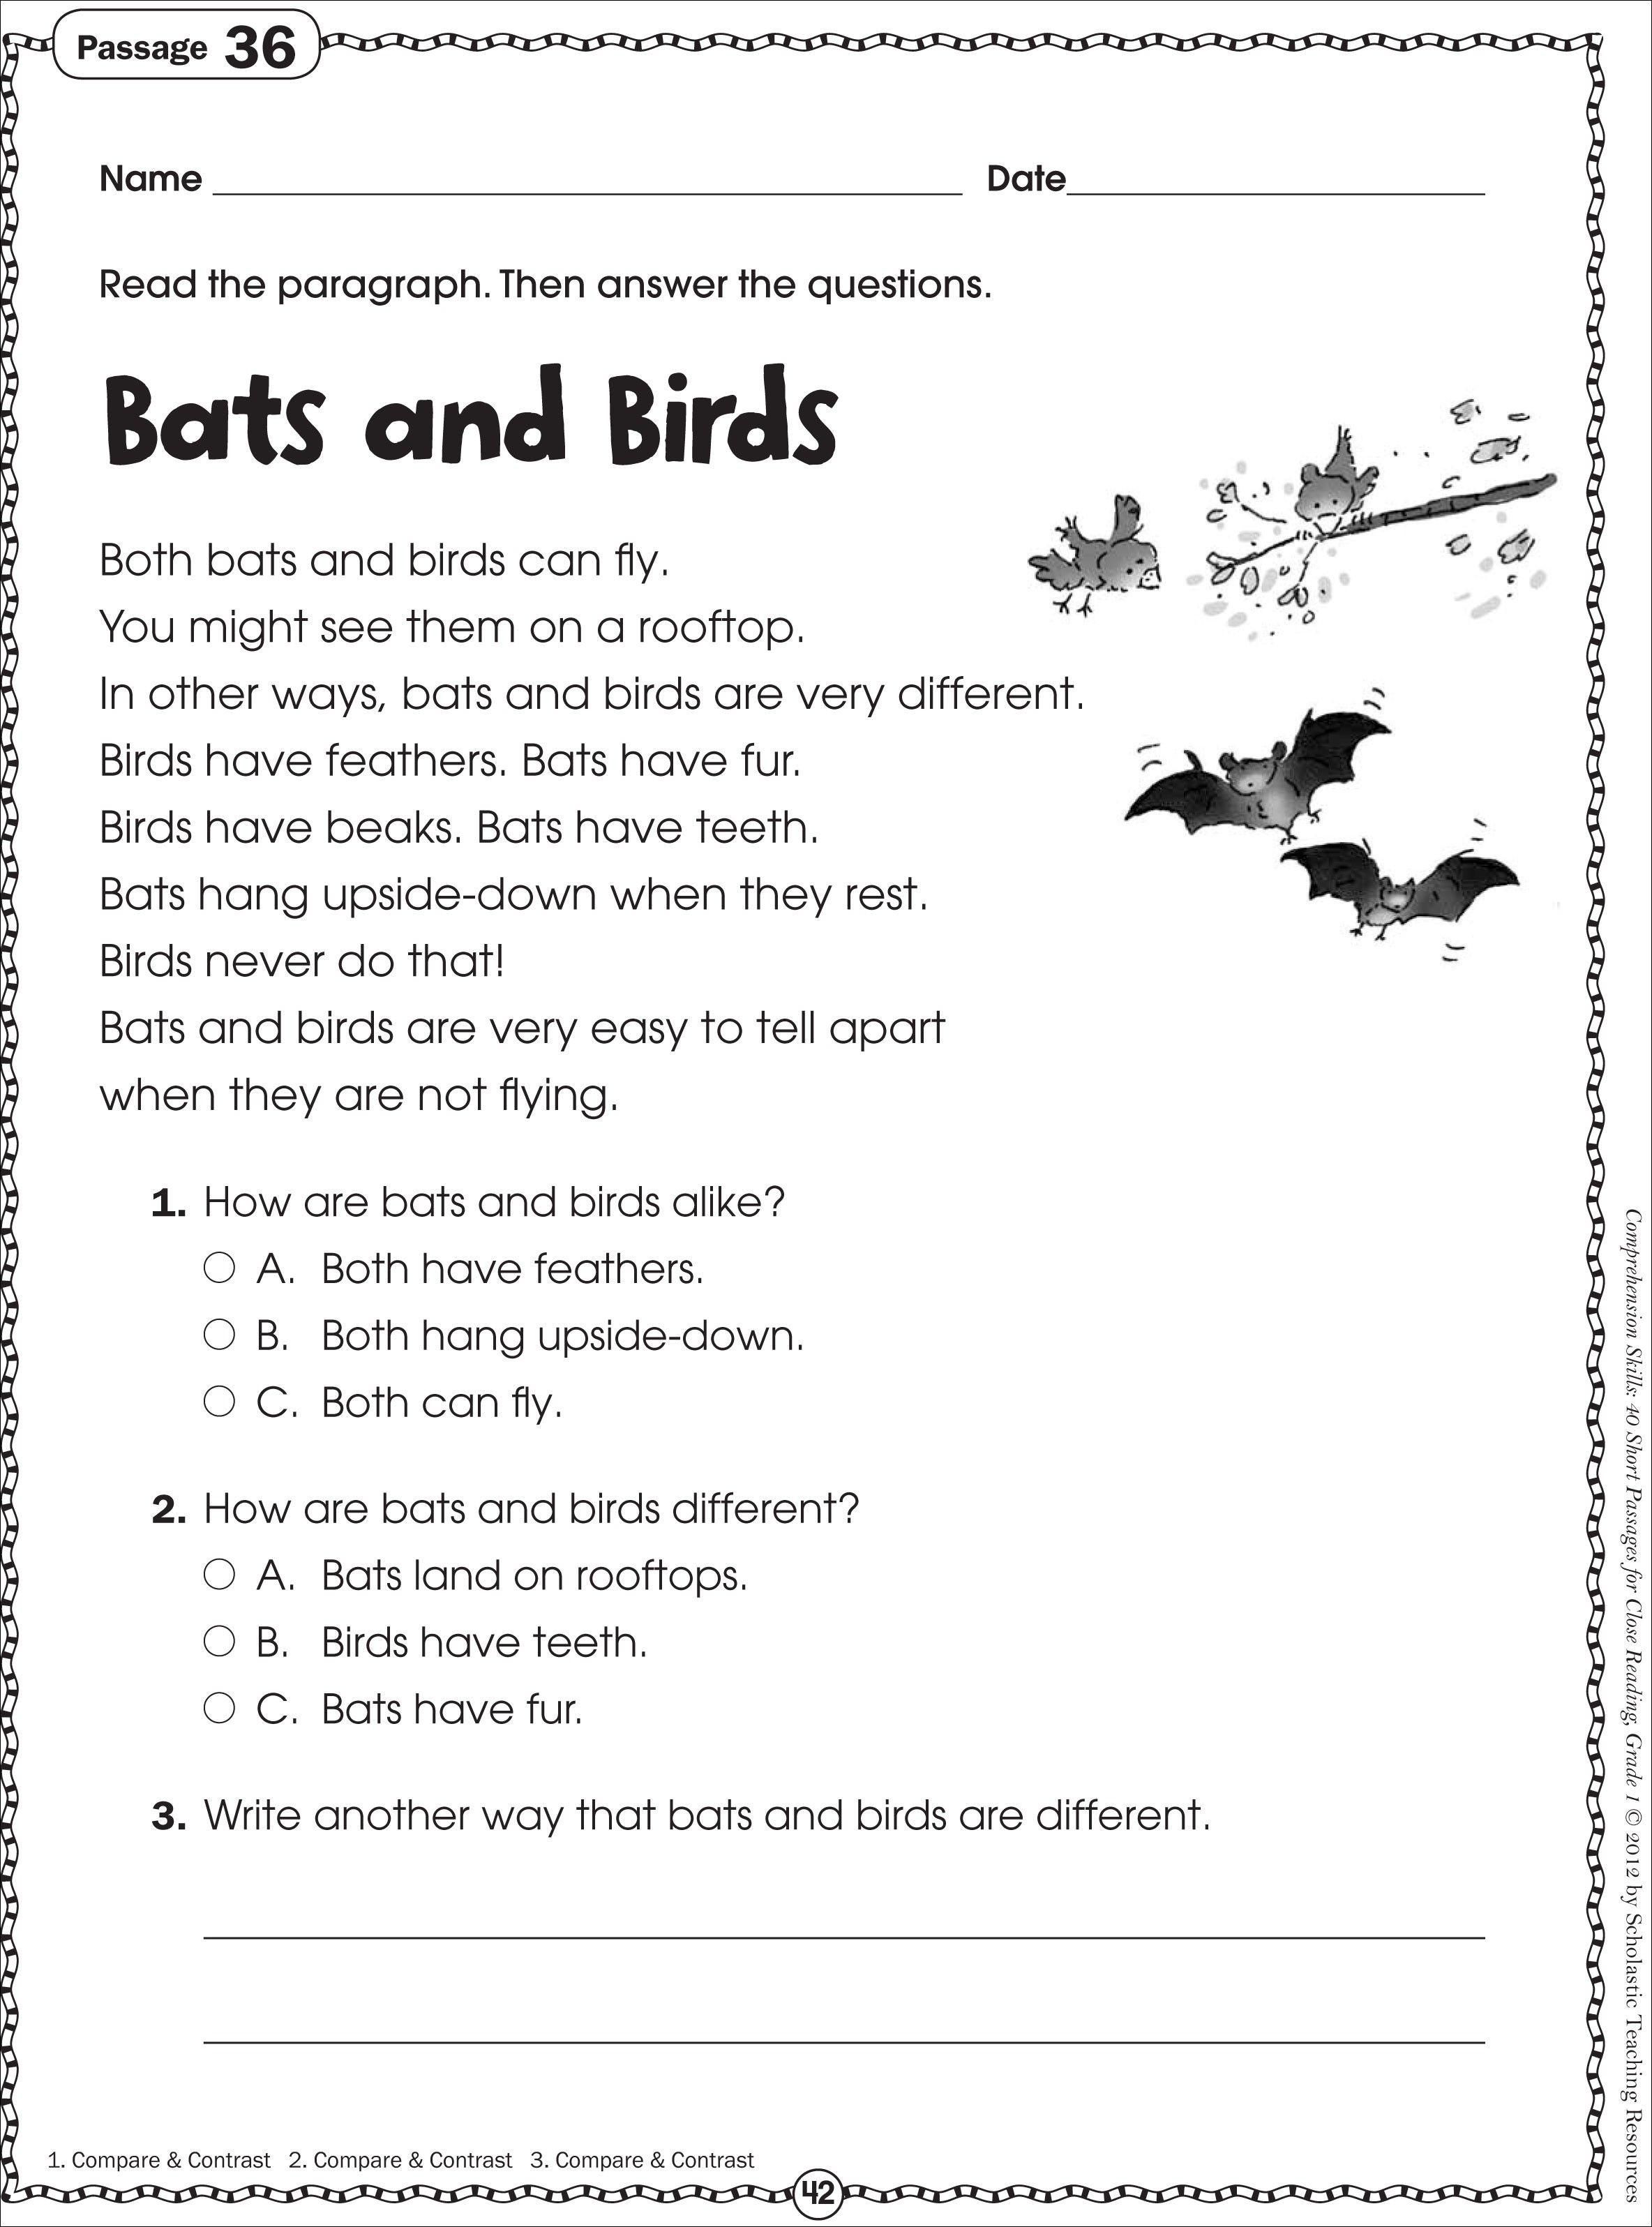 Free 2nd Grade Comprehension Worksheets Free Printable Reading Prehension Worksheets for